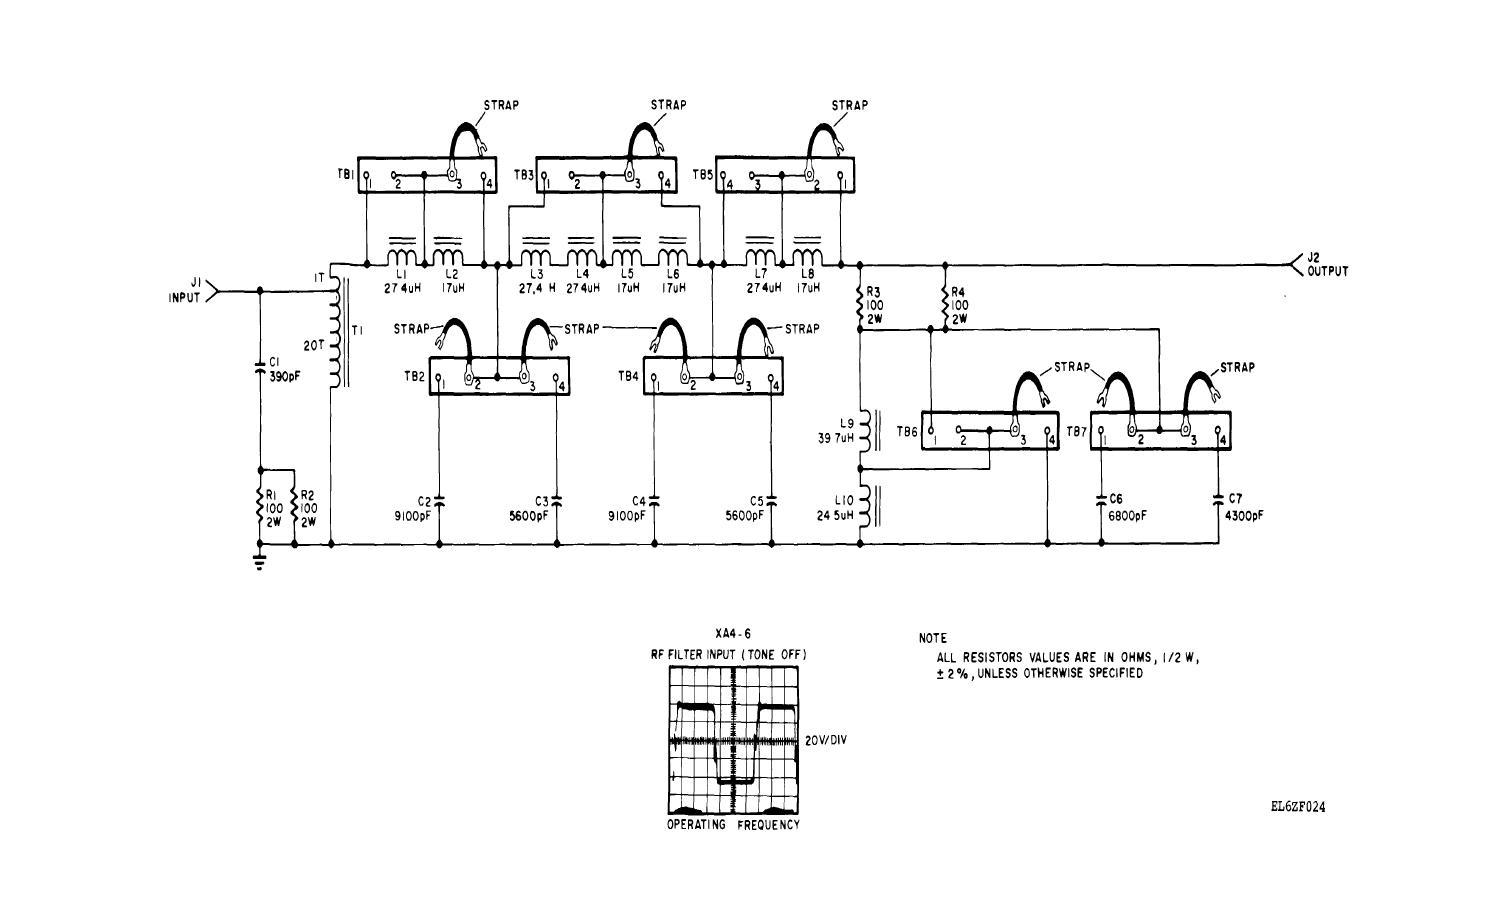 fo 8 rf filter a1a5 schematic diagram